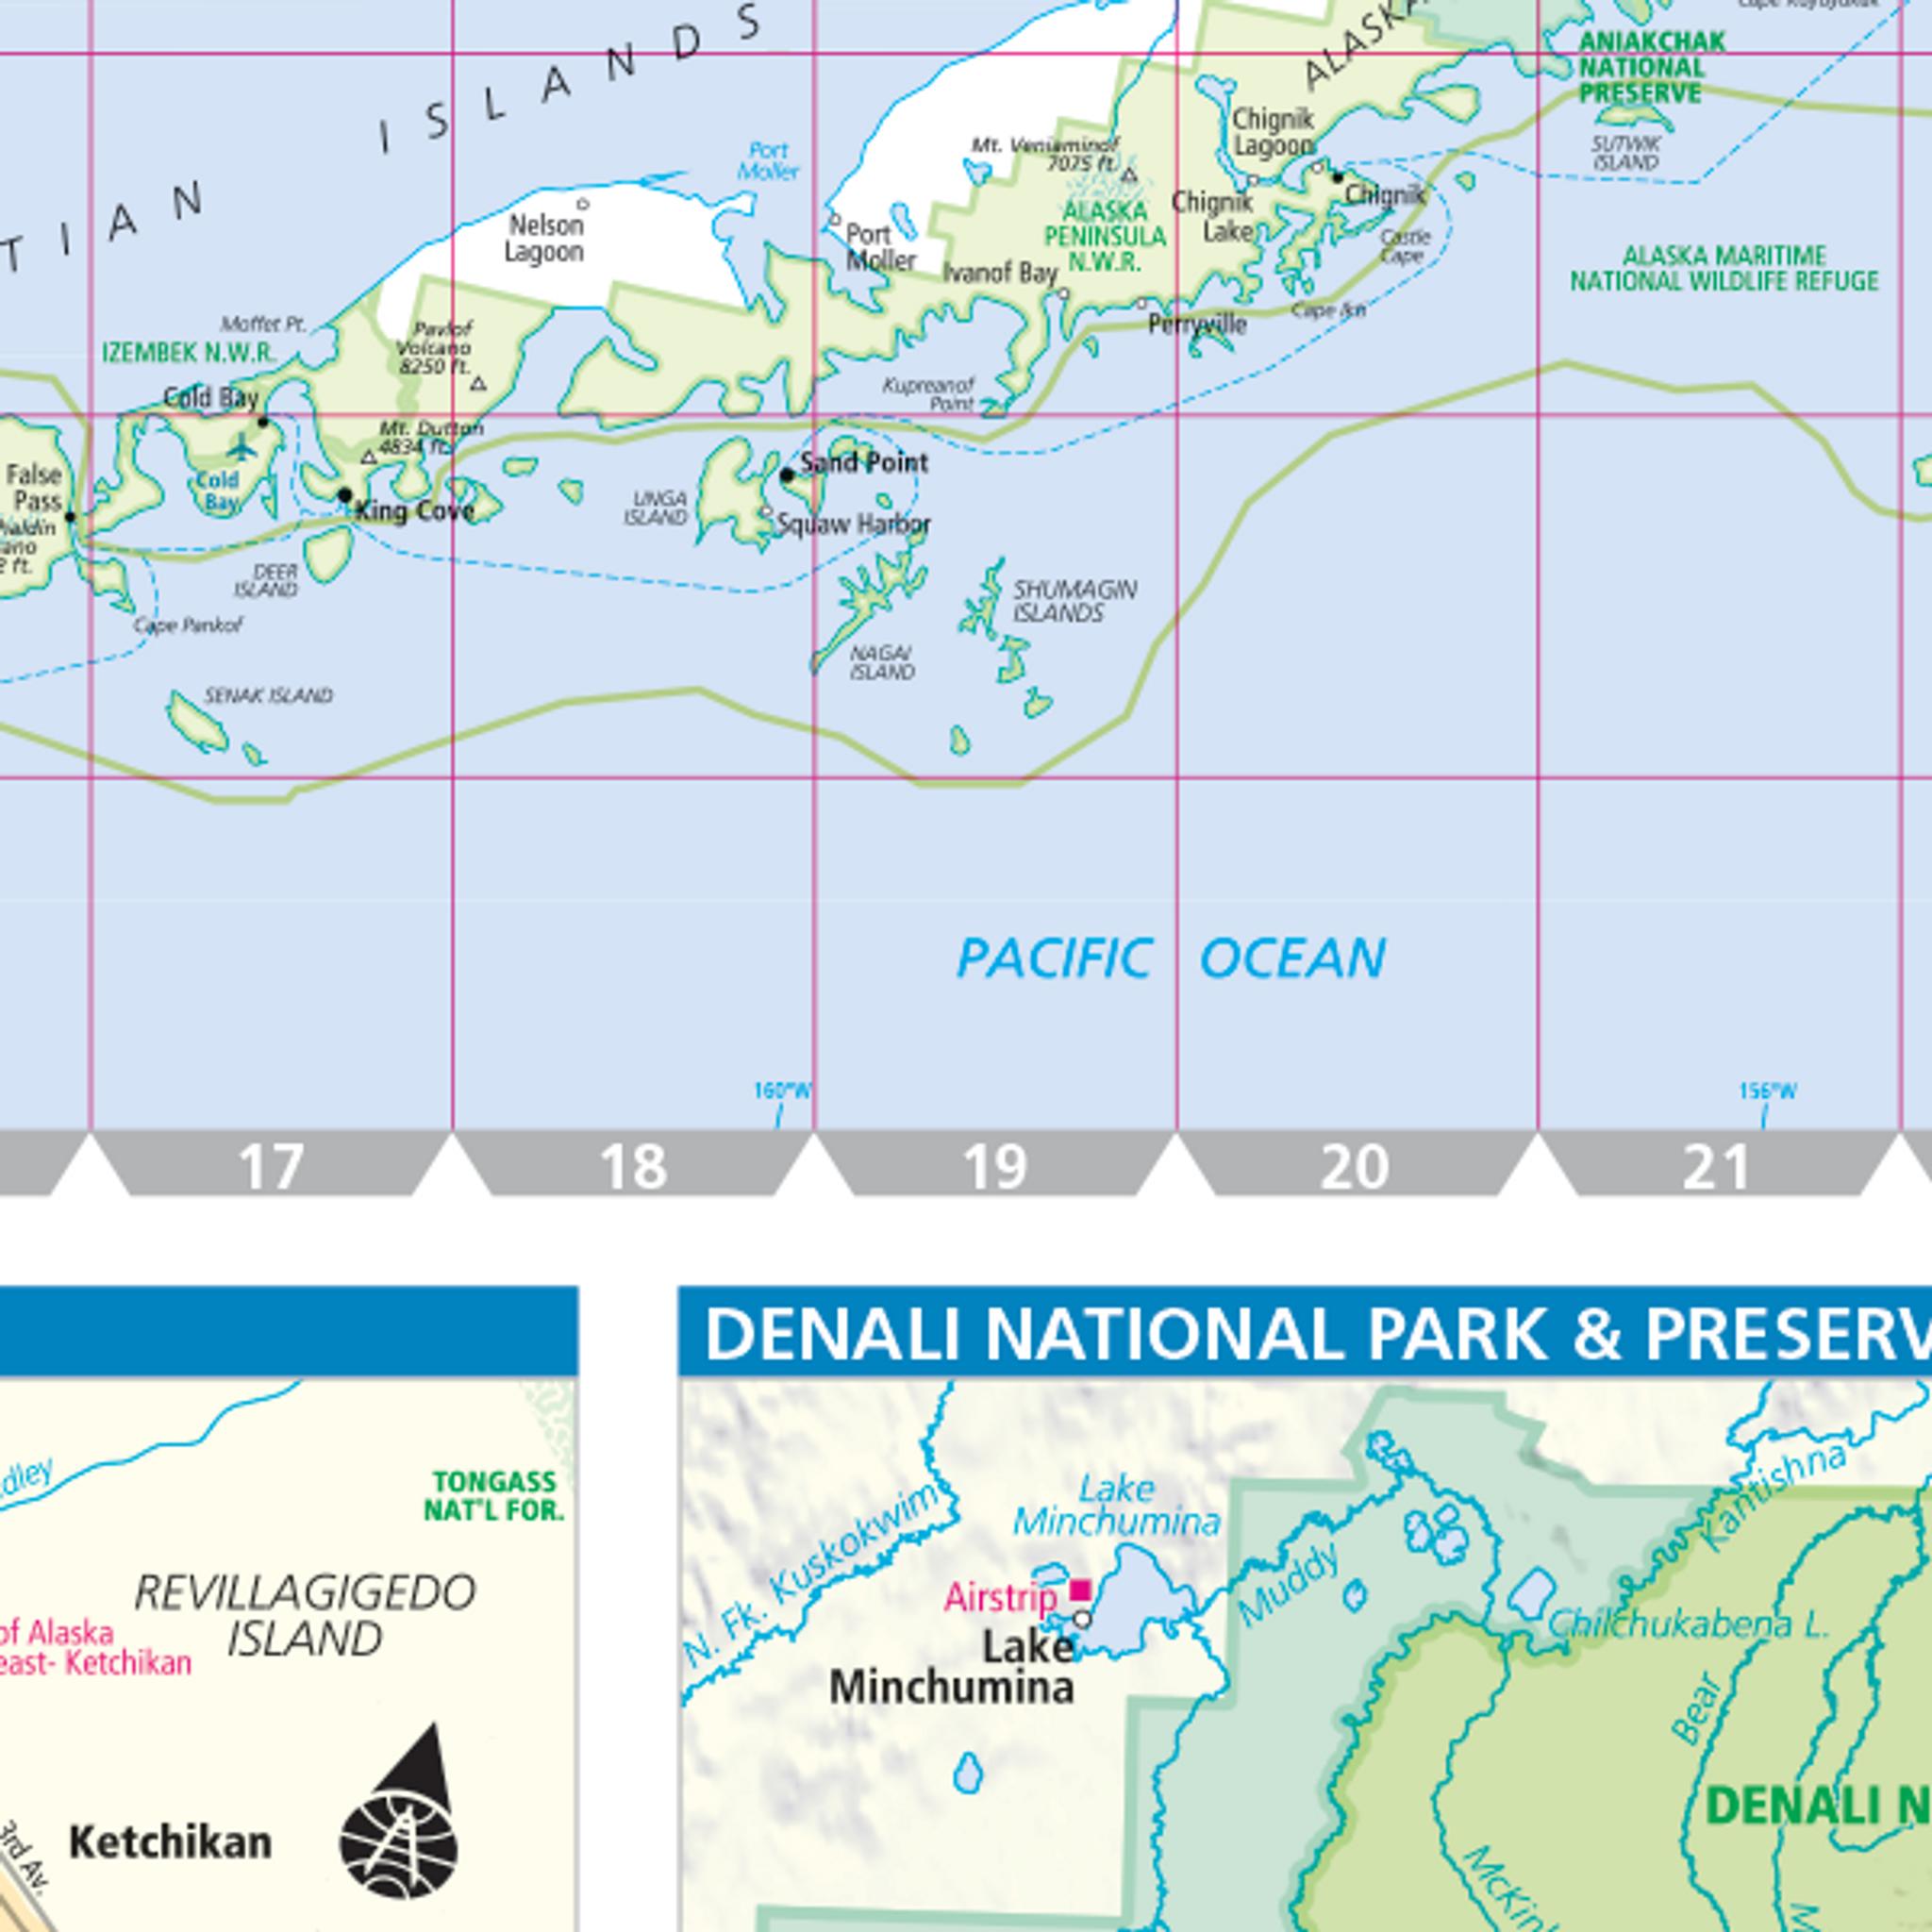 ProSeries Wall Map: Alaska State on aleutian islands map, inside passage map, alabama map, russia map, california map, colorado map, minnesota map, kodiak island map, wyoming map, hawaiian islands map, nova scotia map, north carolina map, arkansas map, connecticut map, yukon map, indiana map, texas map, arizona map, new york map, illinois map, anchorage map, new mexico map, hawaii map, georgia map, north dakota map, idaho map, pacific map, delaware map, louisiana map, florida map, canada map, michigan map, iowa map, bc map,